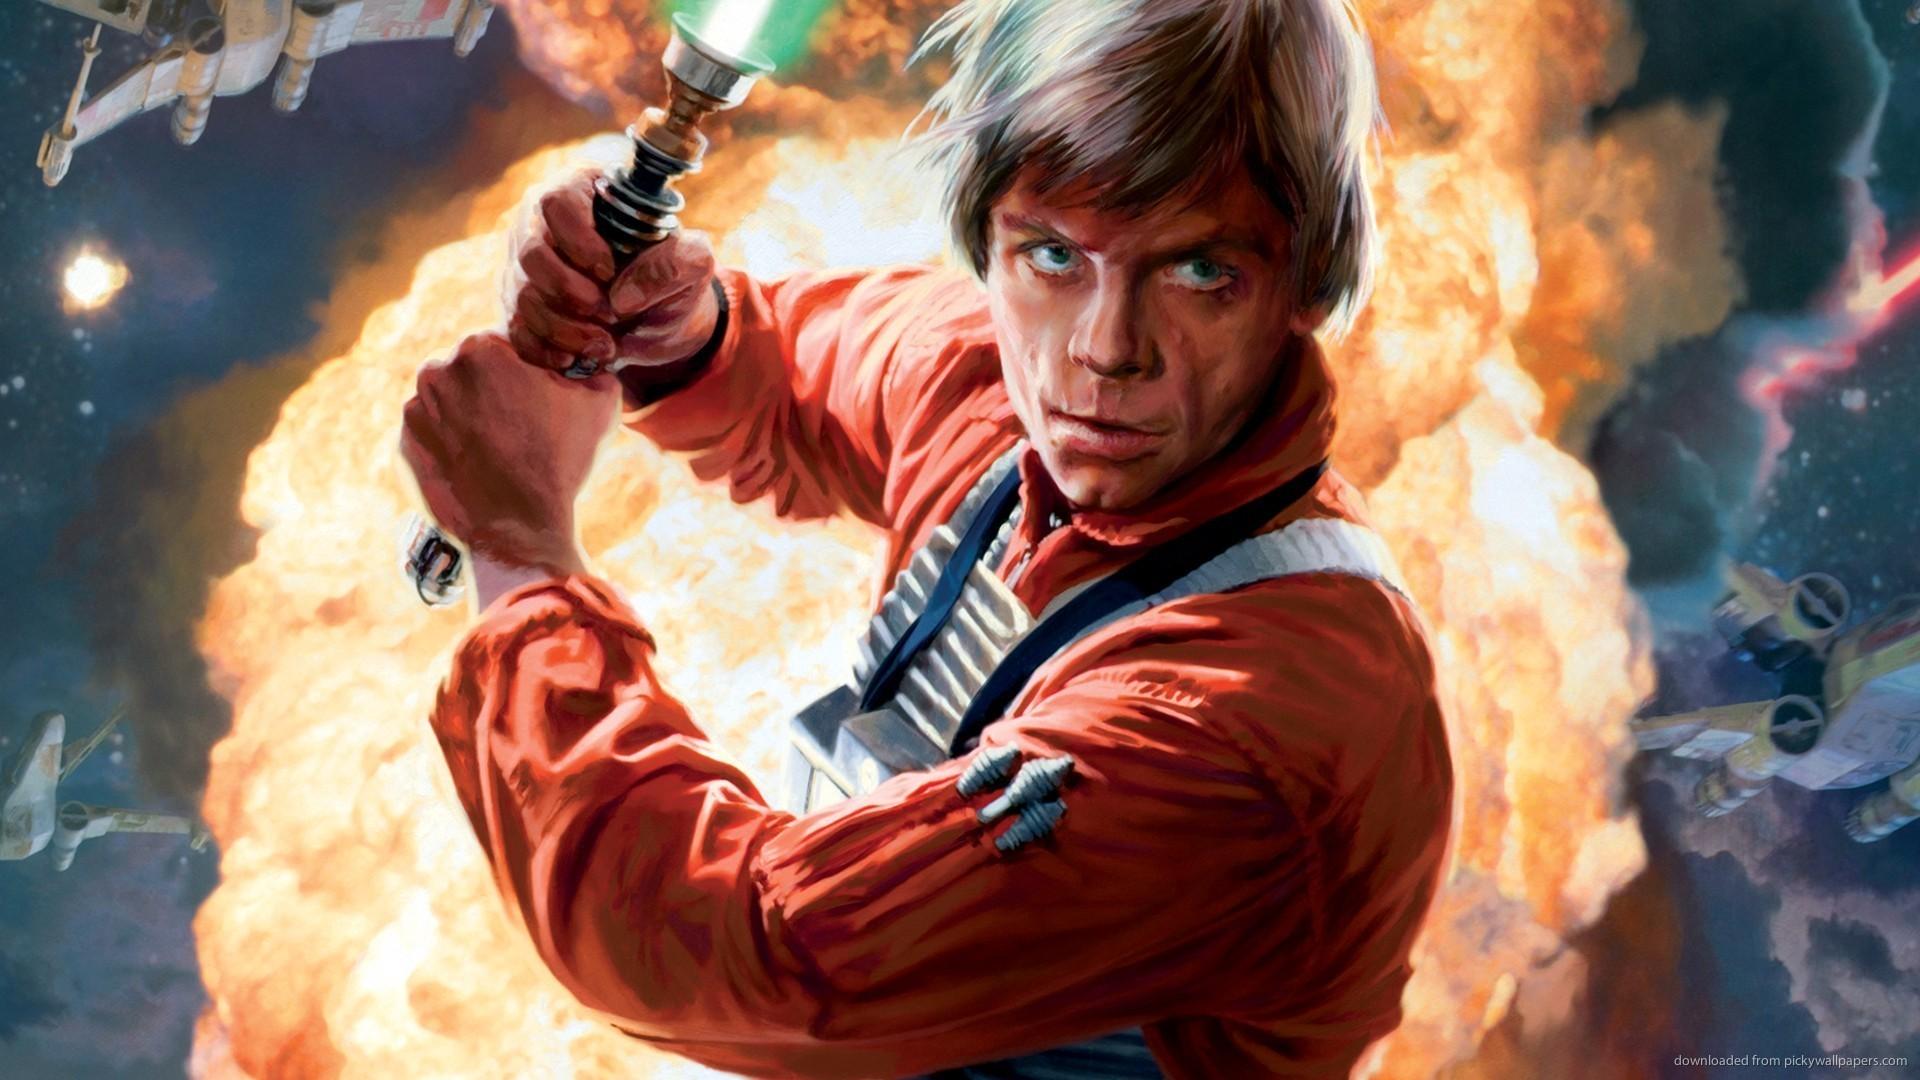 Luke Skywalker Wallpaper hd images 1920x1080